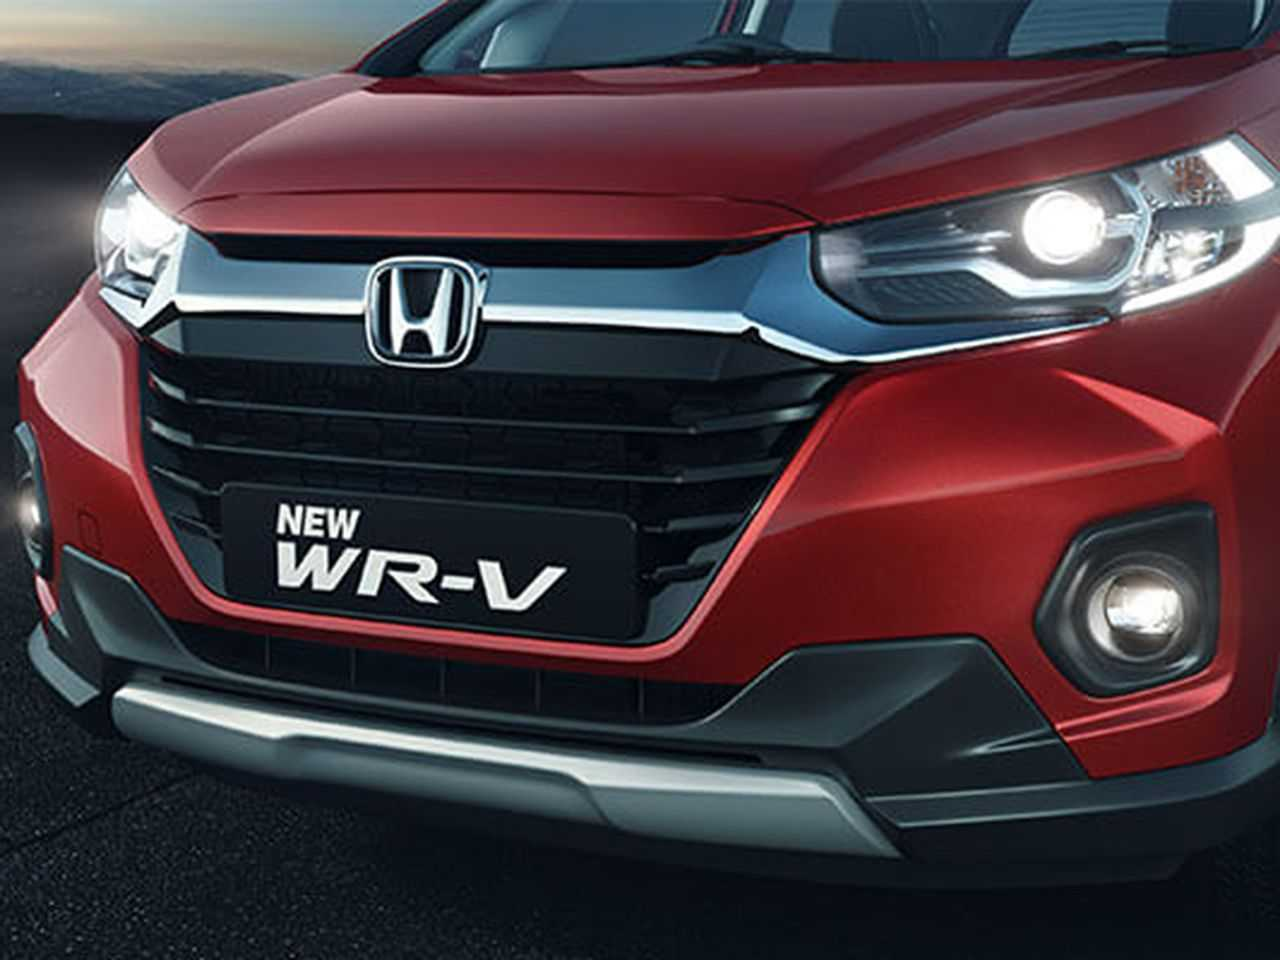 Facelift do Honda WR-V para o mercado indiano